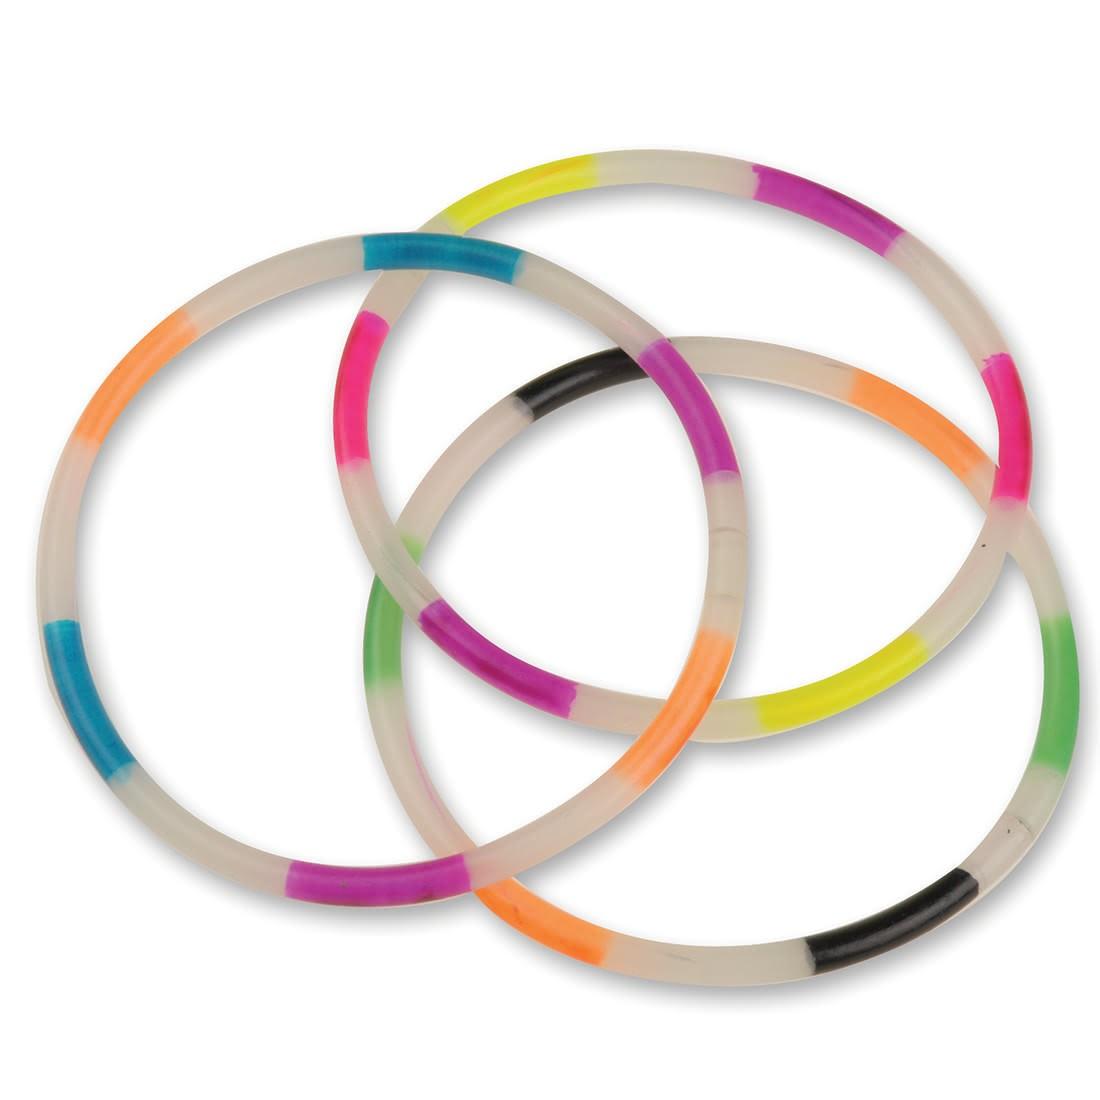 Glow in the Dark Rainbow Bracelets [image]